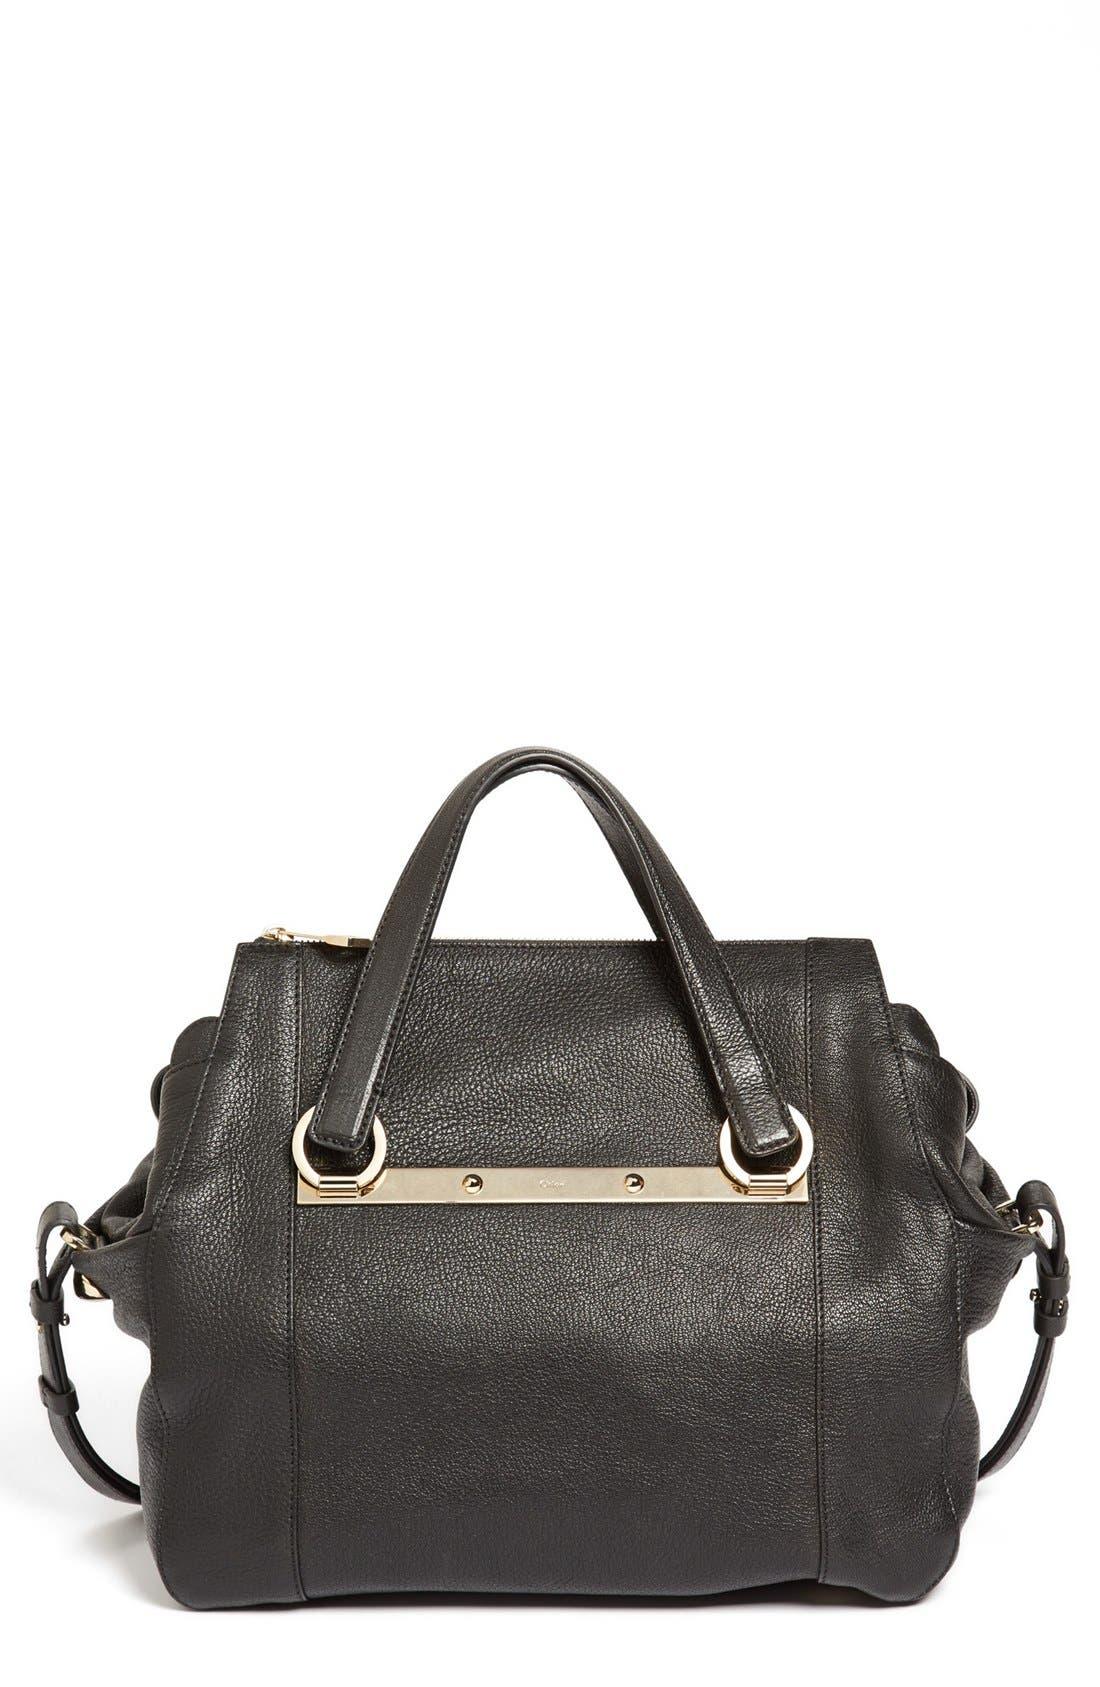 Main Image - Chloé 'Bridget - Small' Shoulder Bag